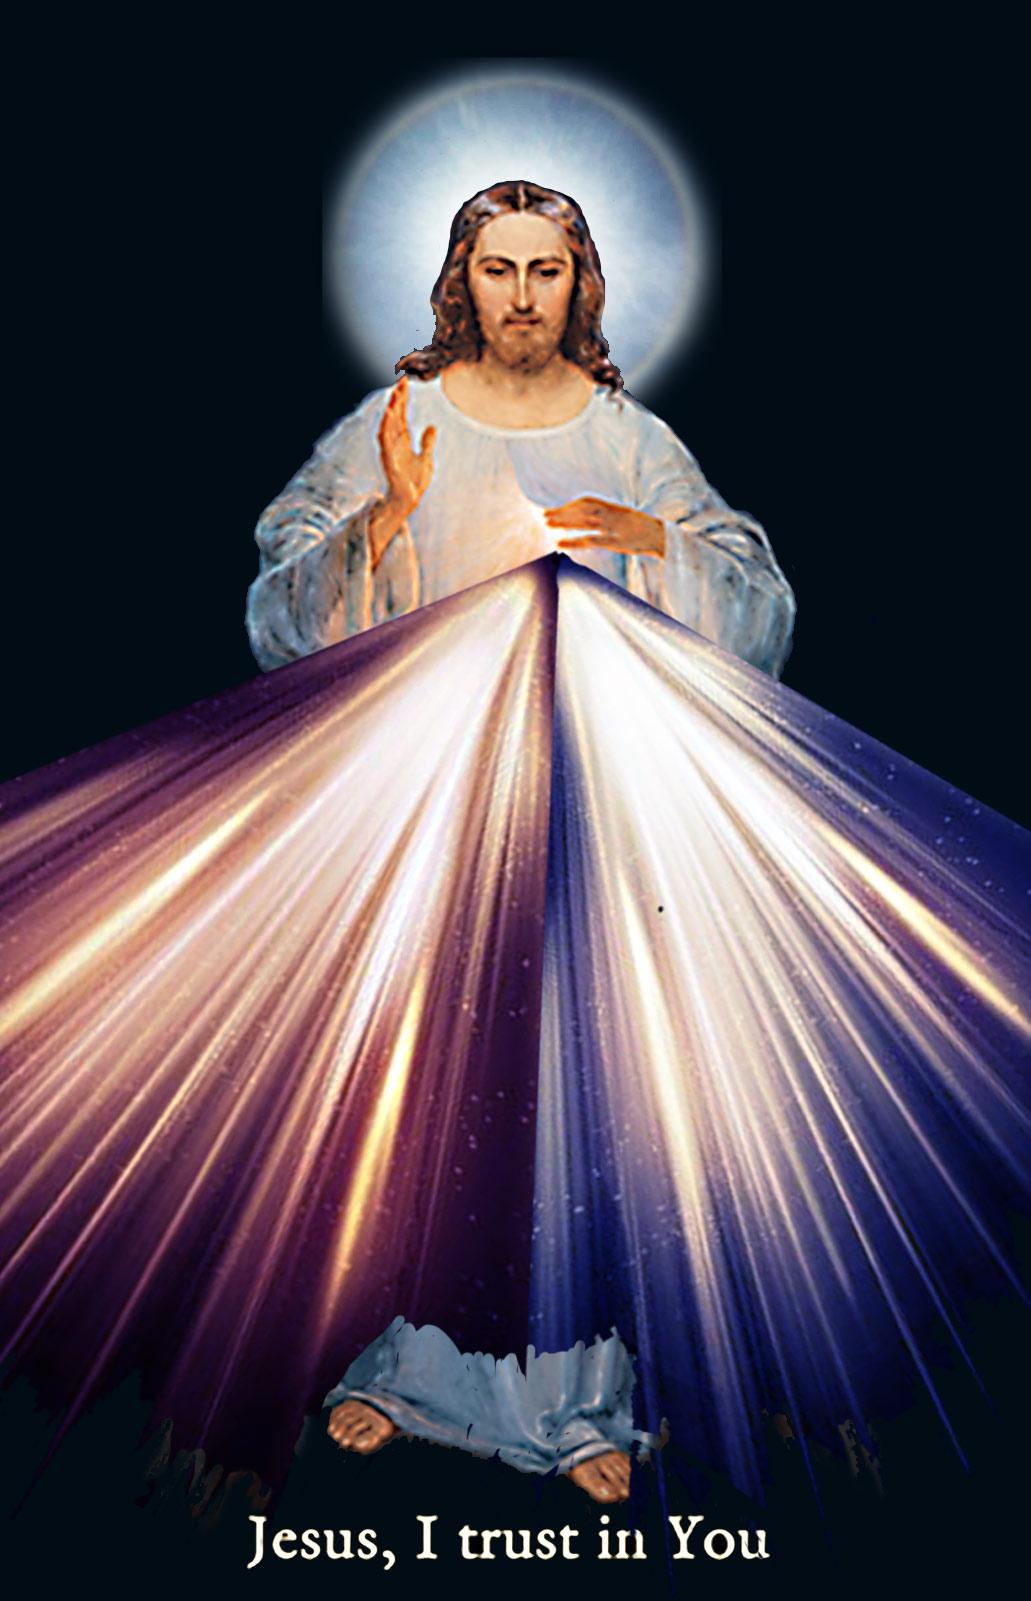 Divine Mercy  Vilnius image - Digitally enhanced